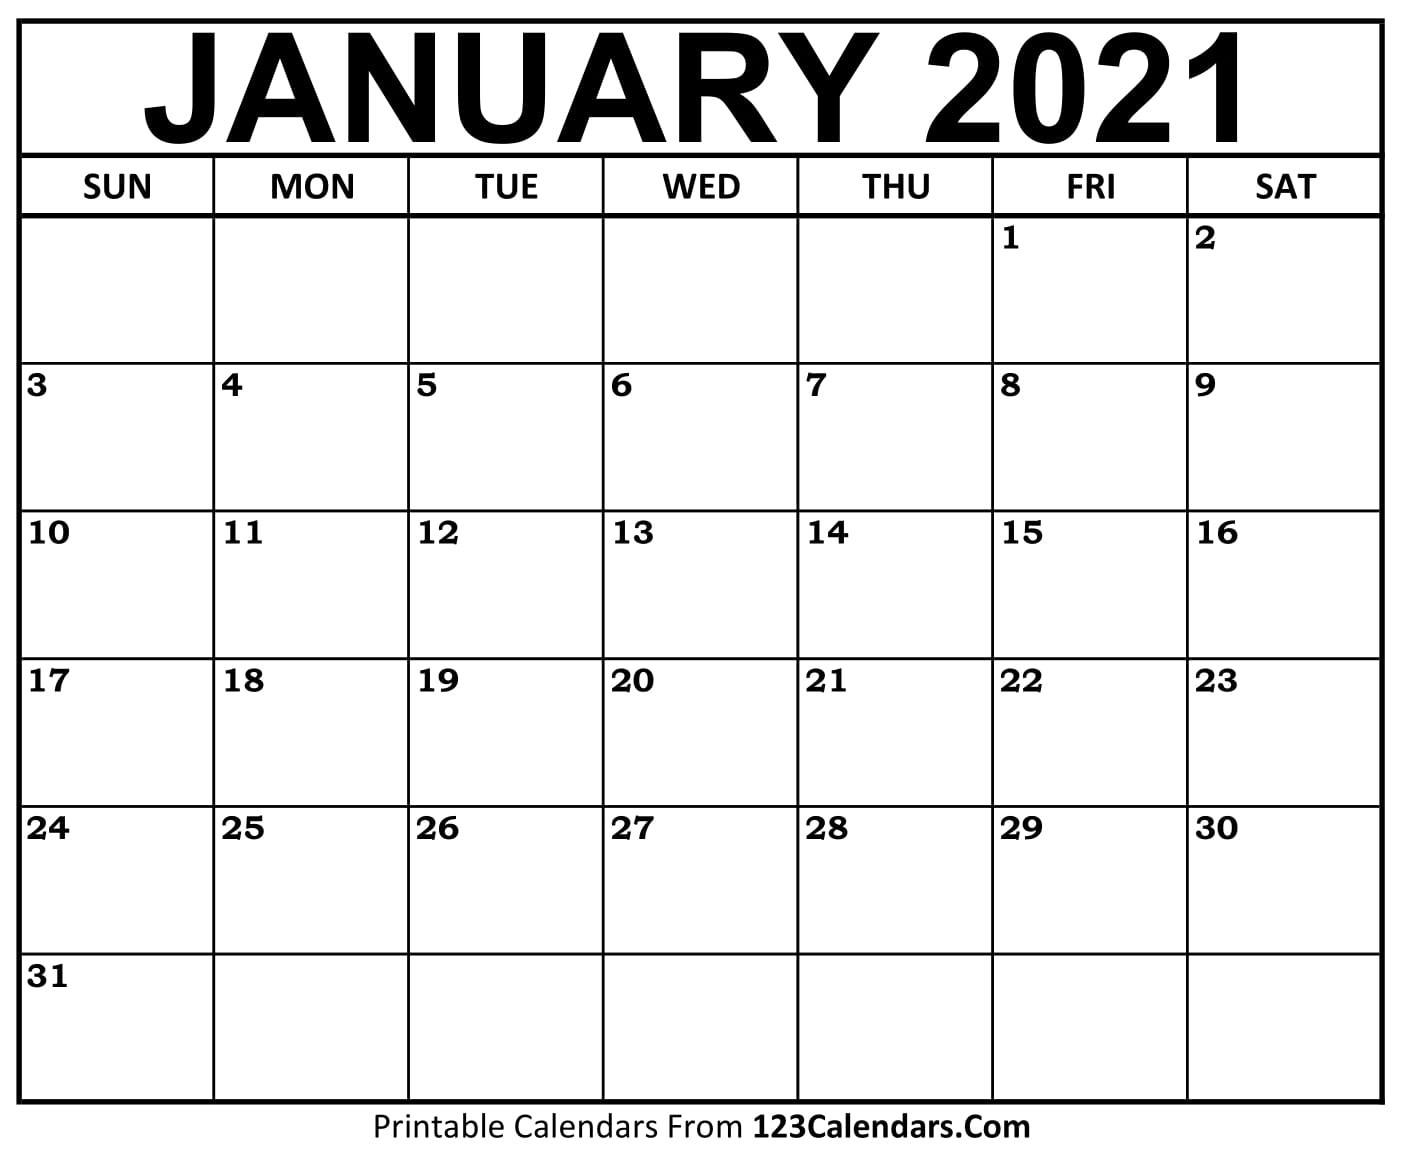 2021 Printable Calendar | 123Calendars  Free Calendar 2021, 2021